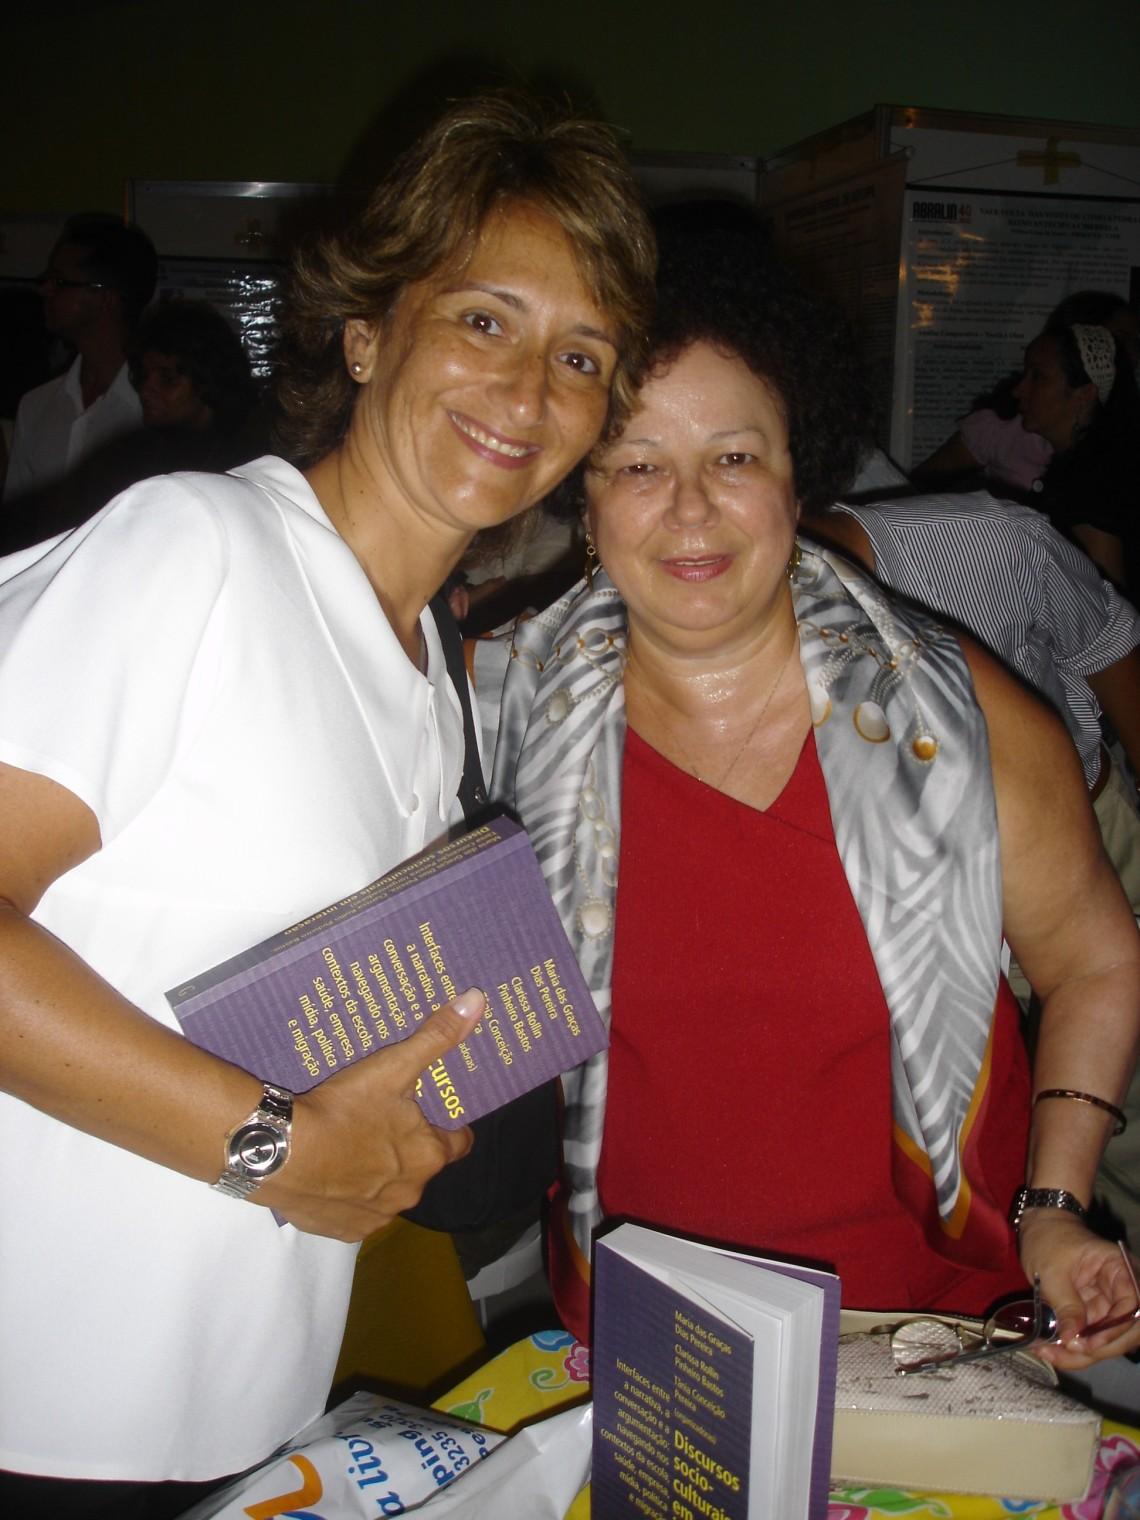 Profa. Cristina (PUC-Rio) e Profa. Graça